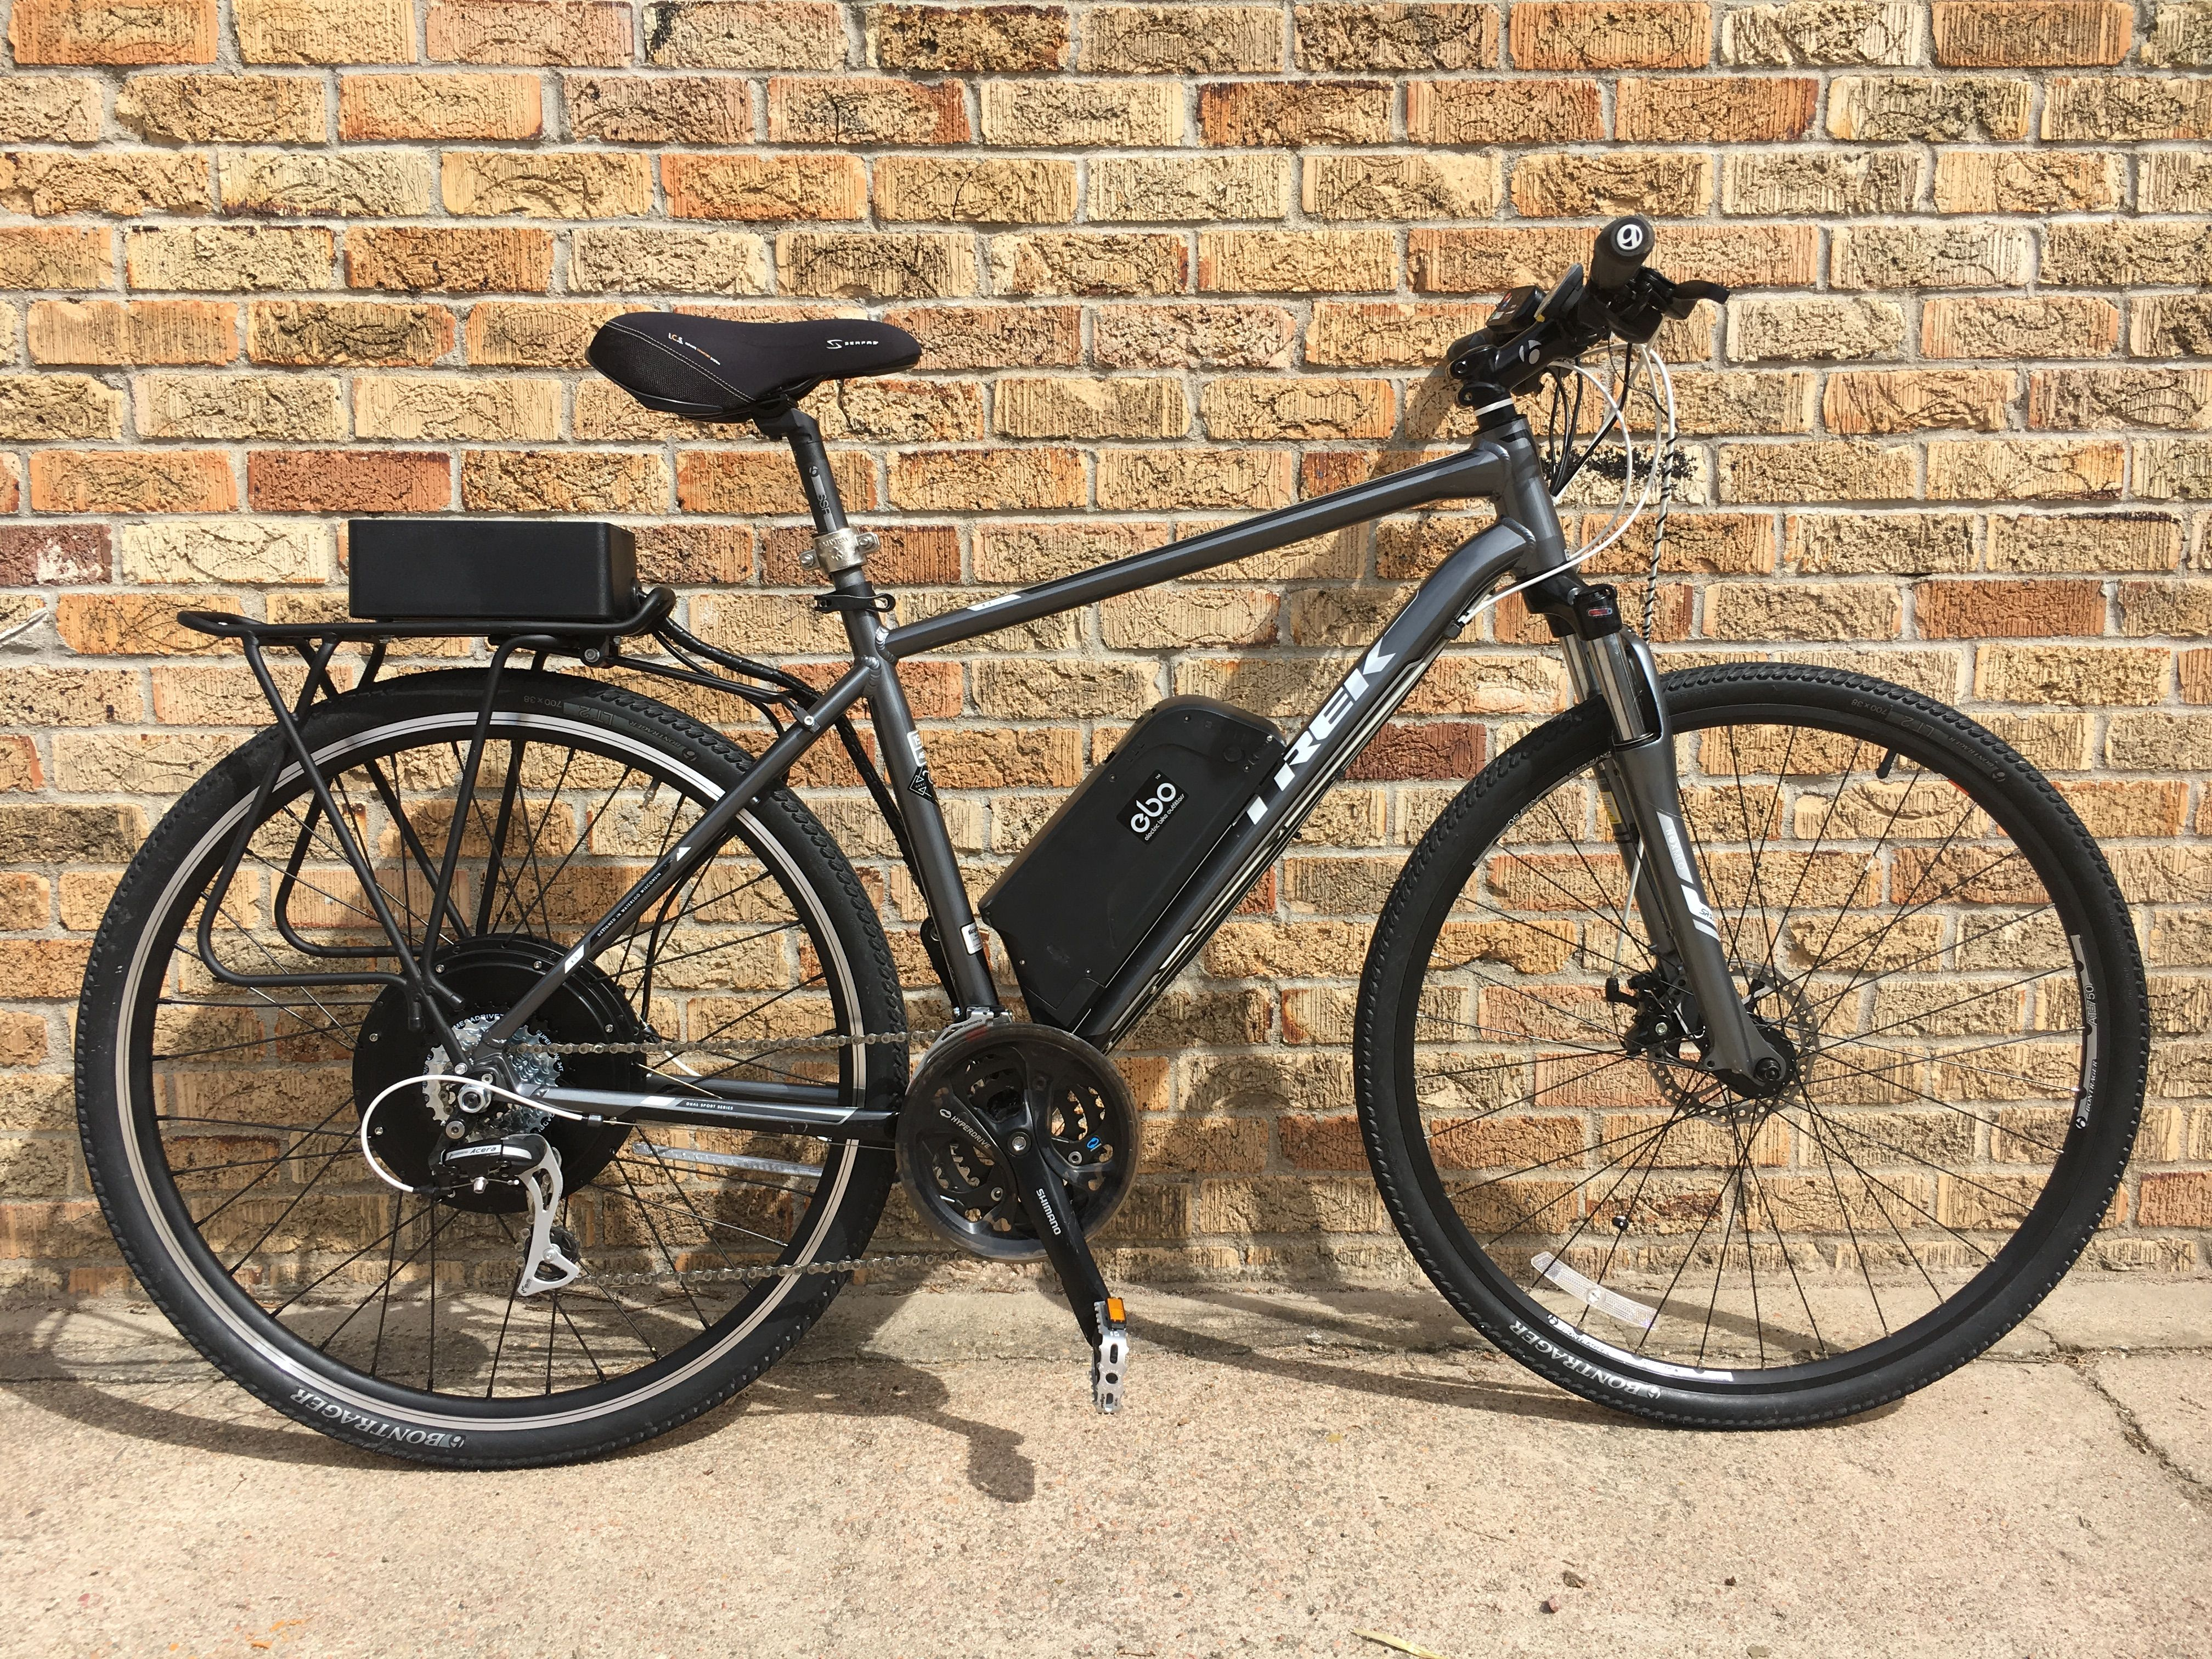 Ebo Mountaineer Electric Bike Kit Installed On A Trek 8 3 Ds Bike